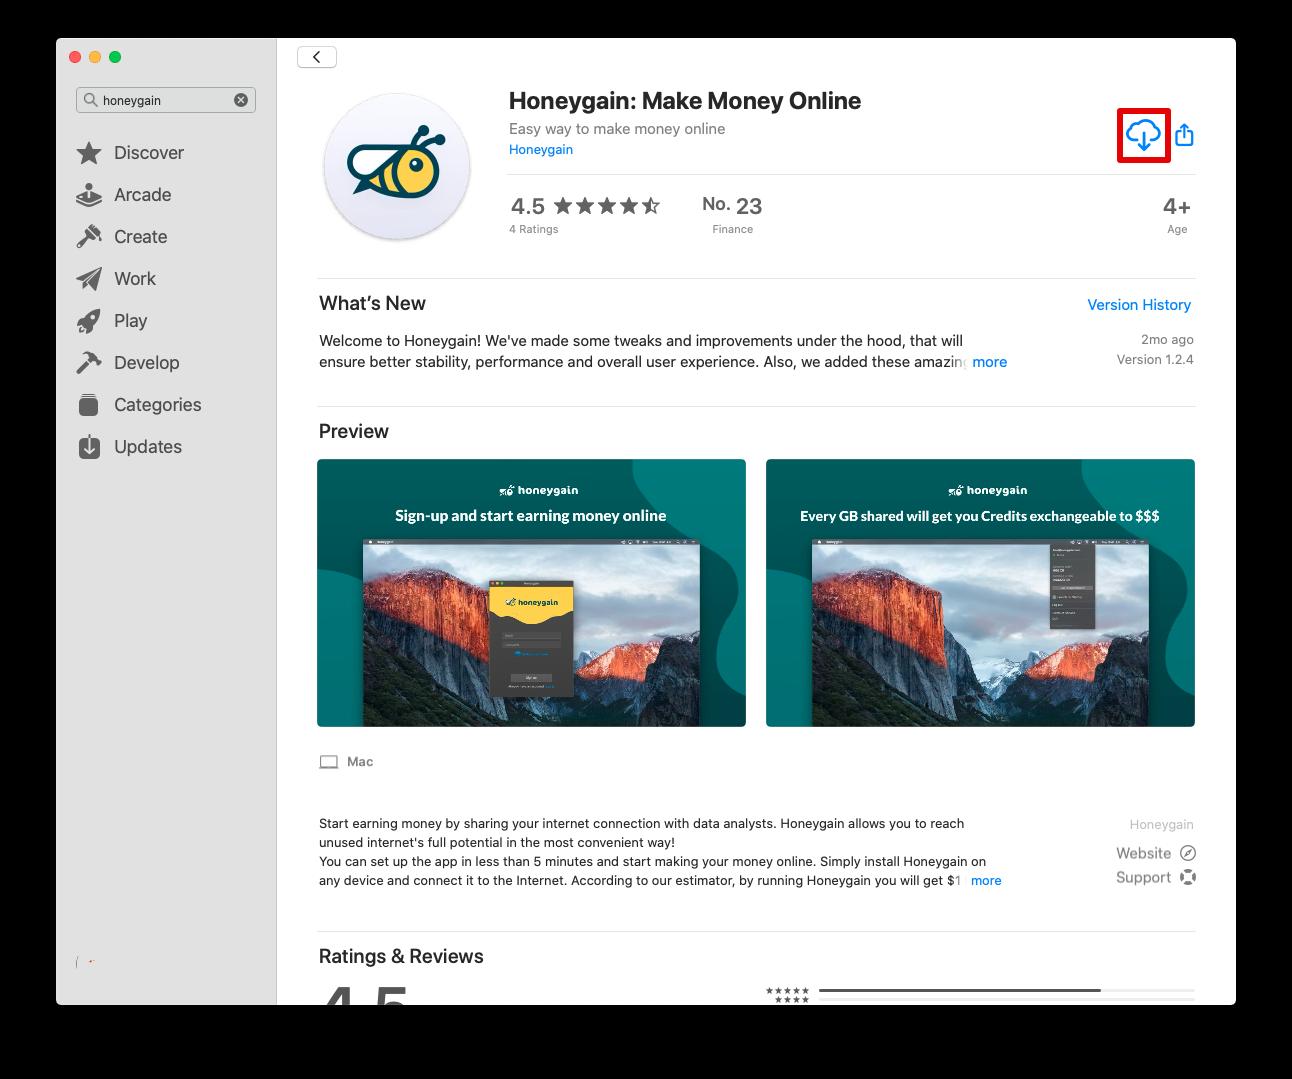 App_Store_2020-08-27_14-38-51.png